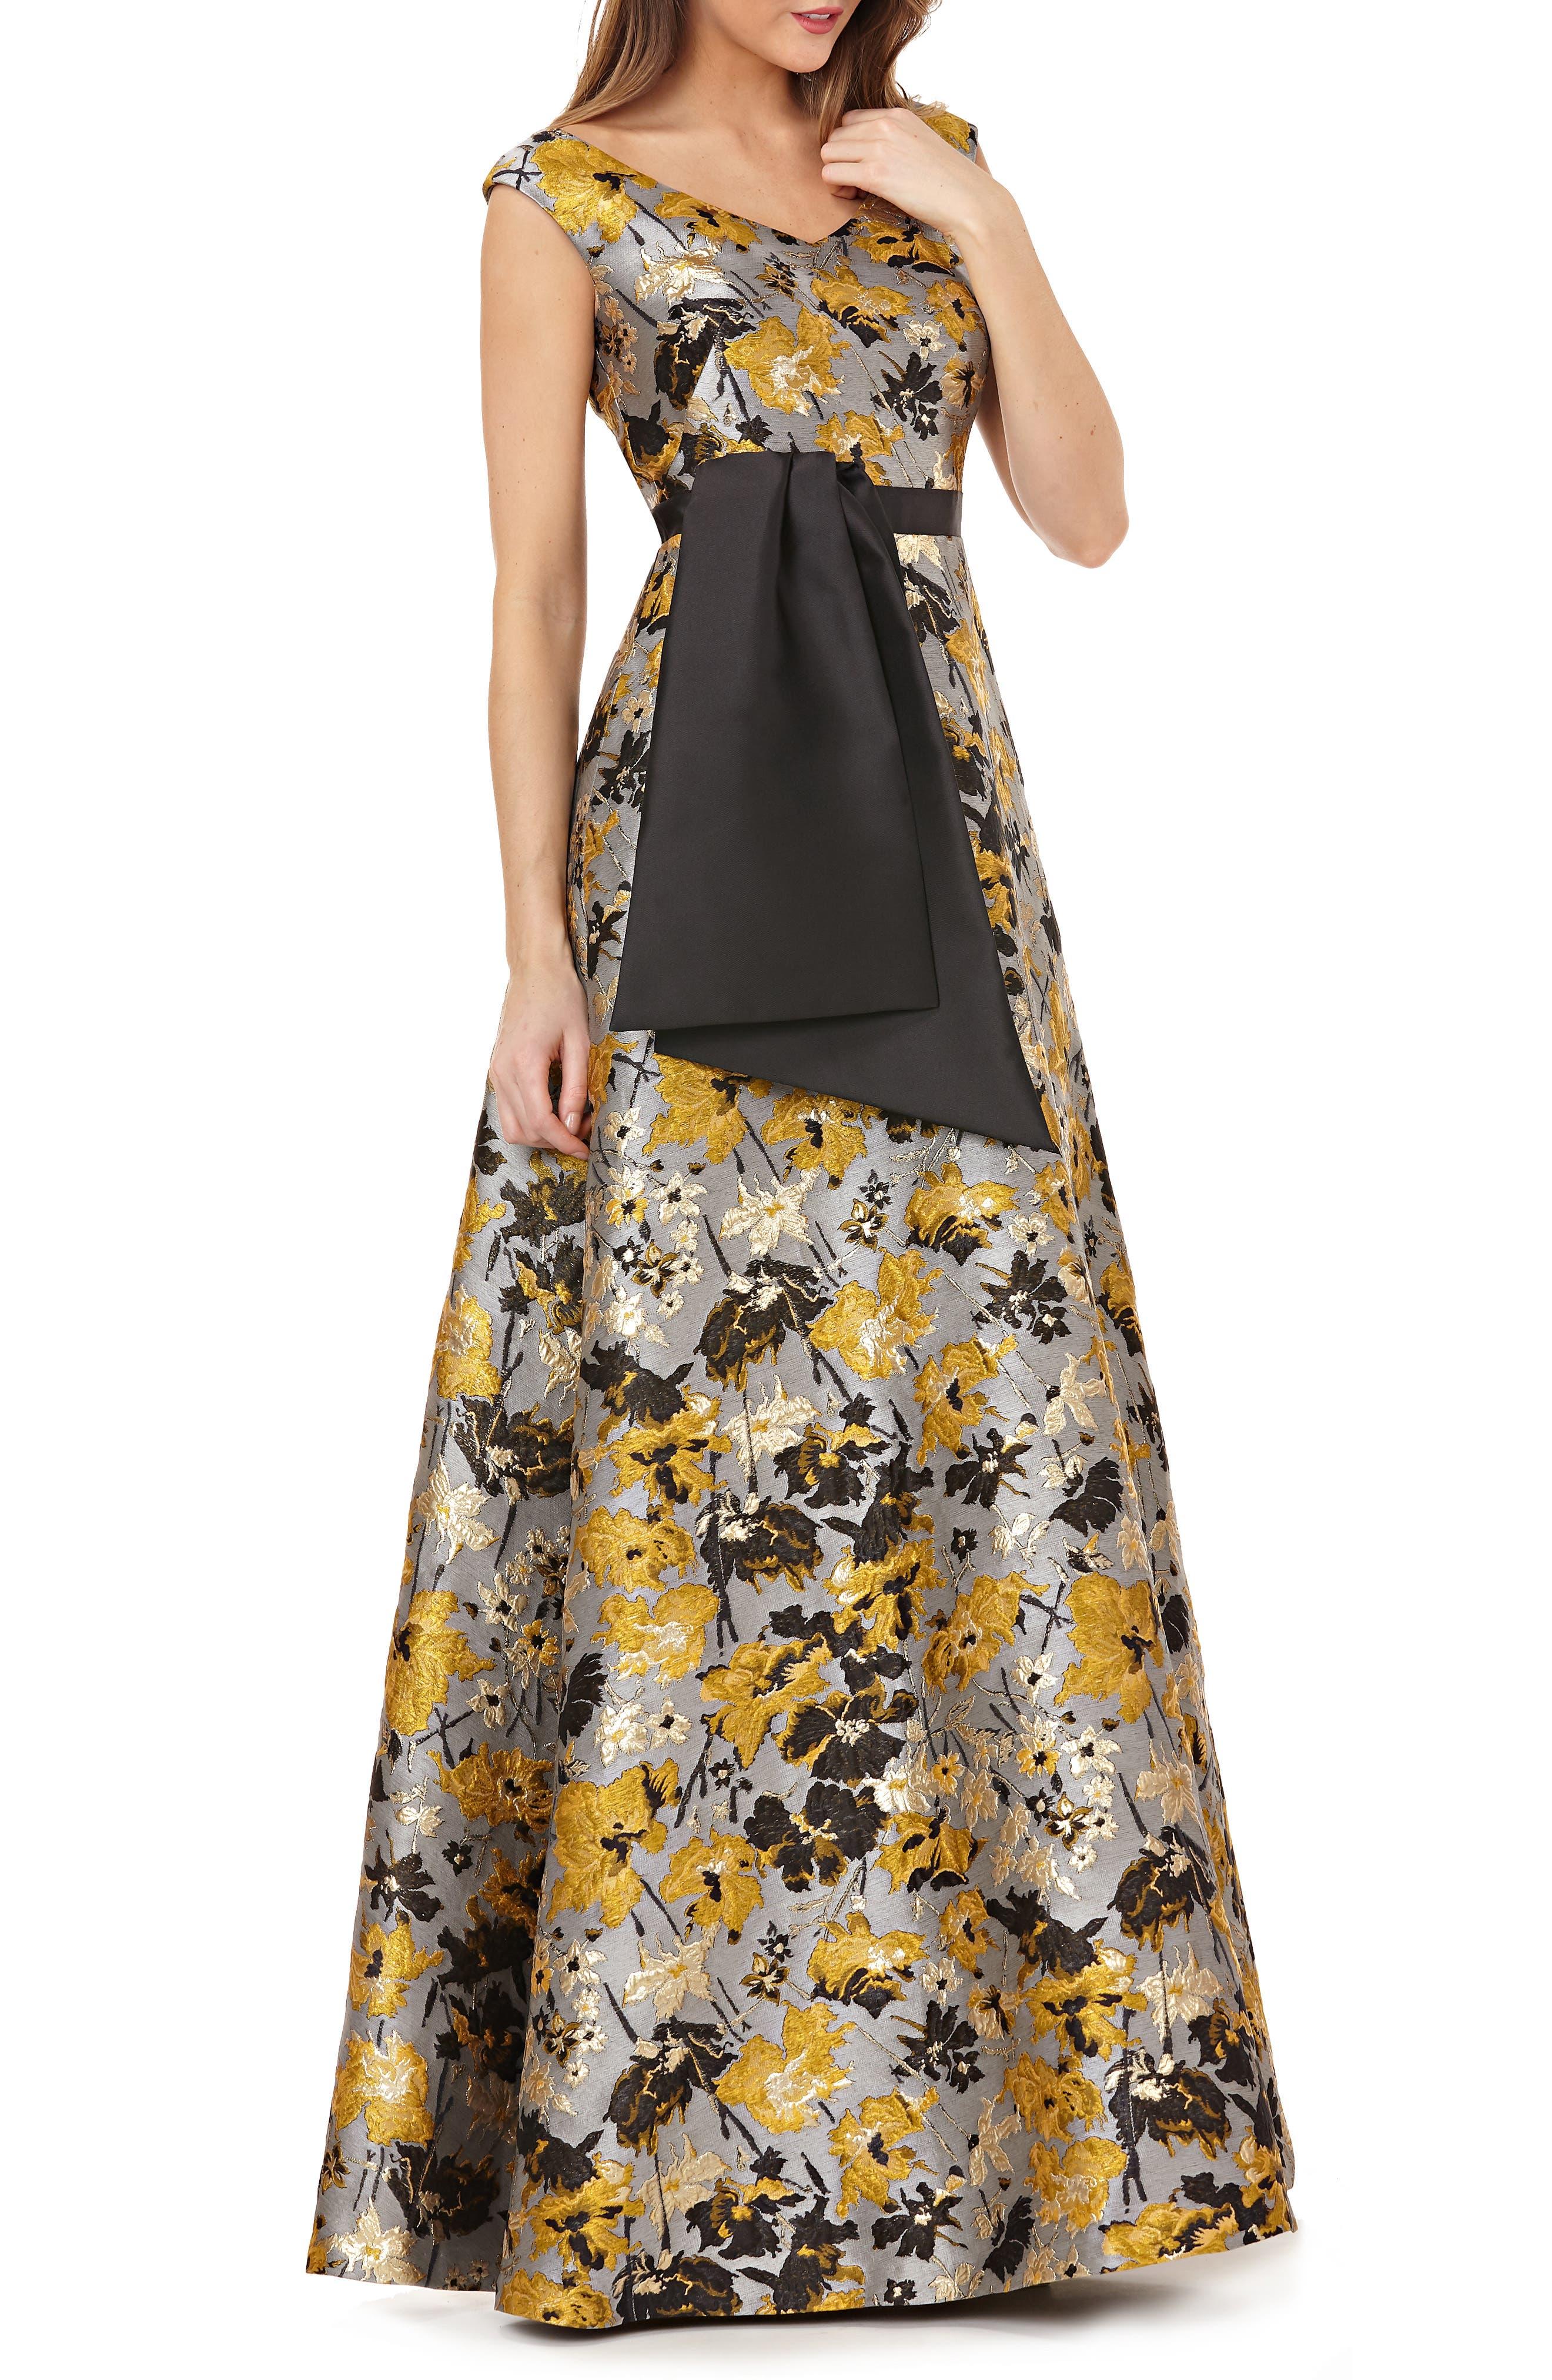 KAY UNGER Portrait Floral Jacquard Gown in Dijon